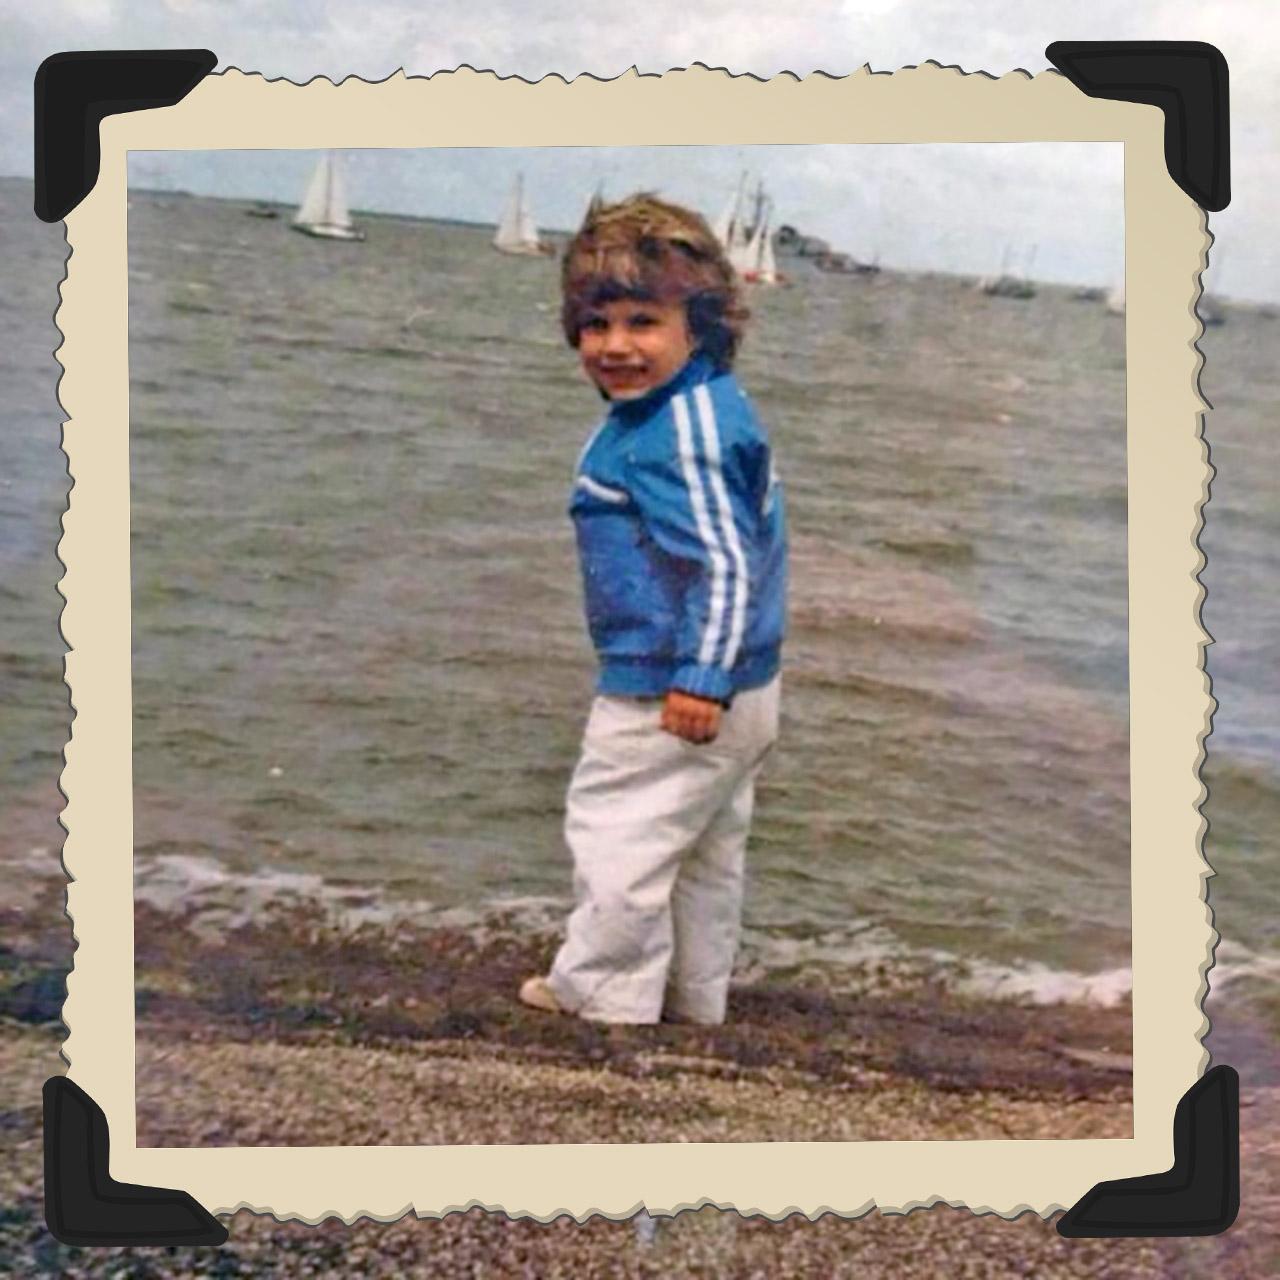 Robin van Persie as a child